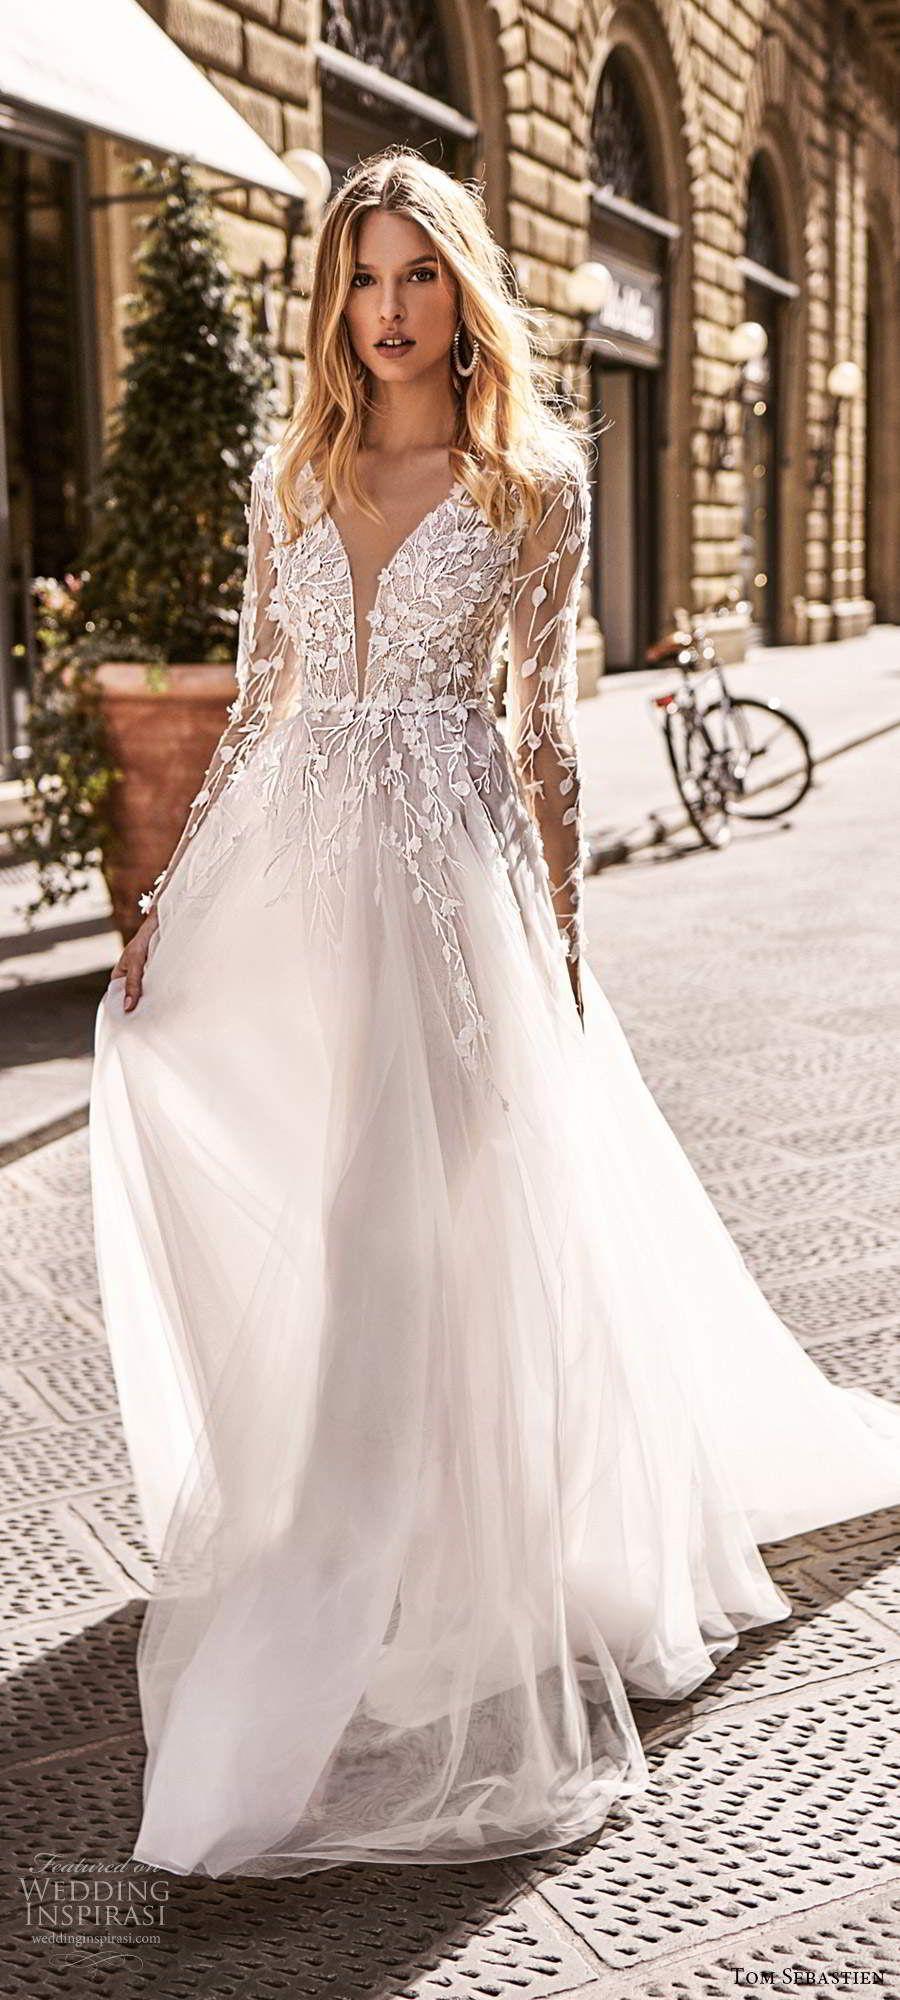 Tom Sebastien 2020 Wedding Dresses Florence Bridal Collection Wedding Inspirasi Wedding Dresses Wedding Dress Couture Ball Gown Wedding Dress [ 2000 x 900 Pixel ]